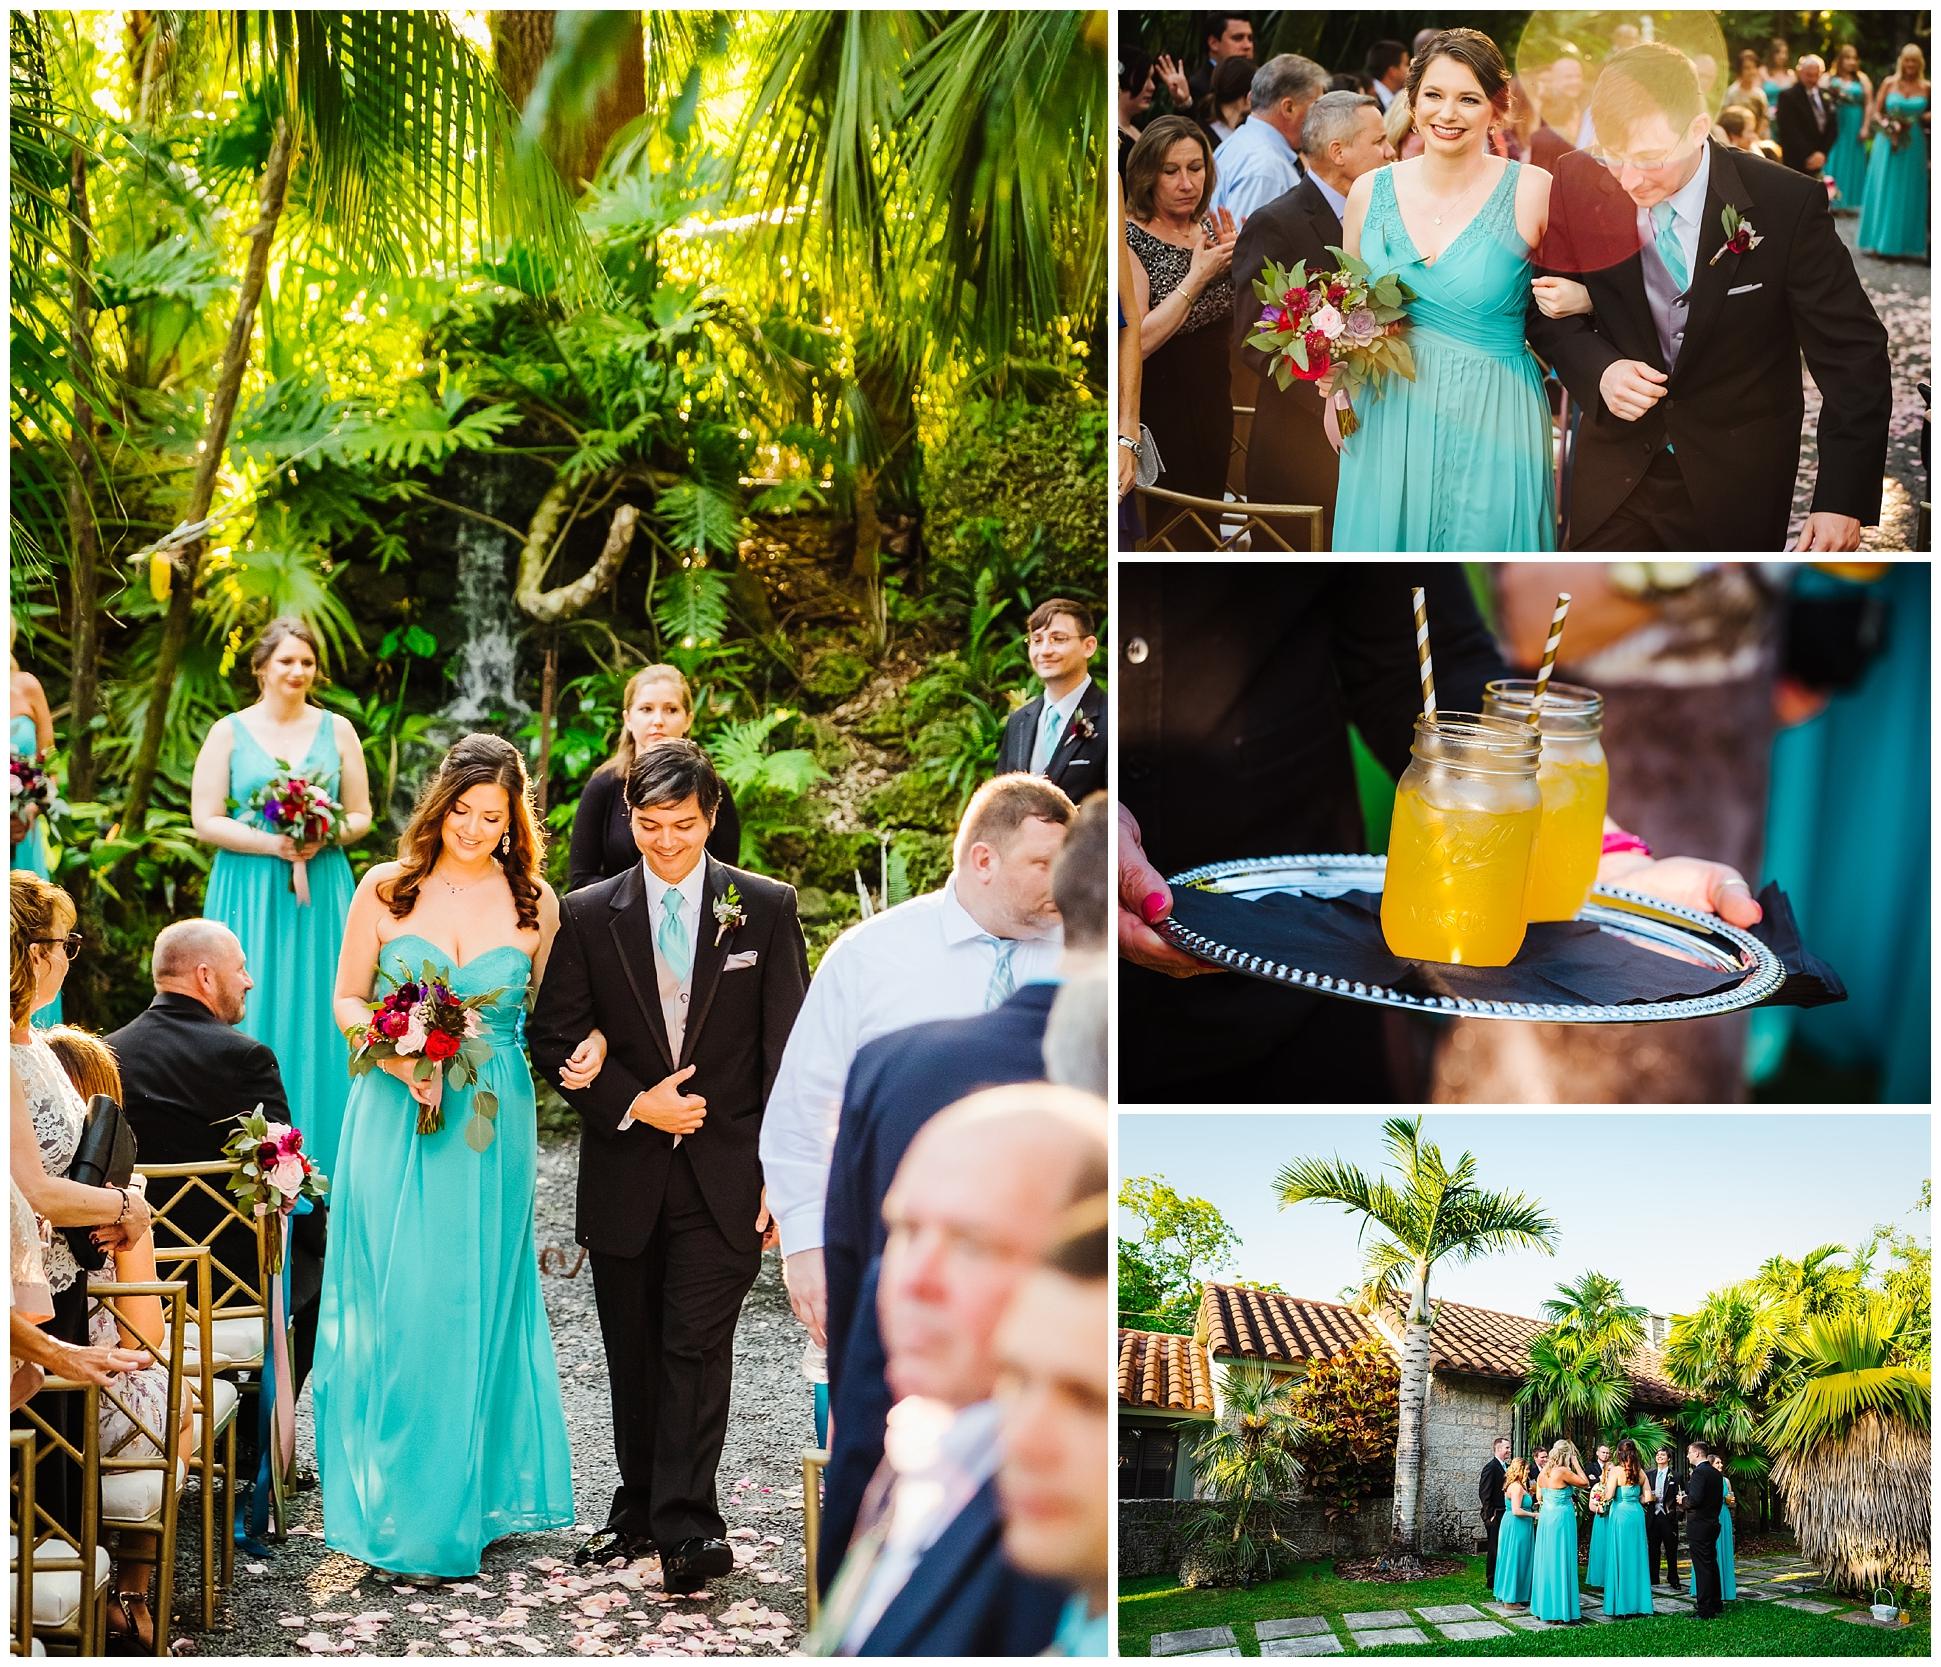 florida-destination-wedding-photographer-enchanted-tropical-miami-homestead-cooper-estate-teal_0055.jpg